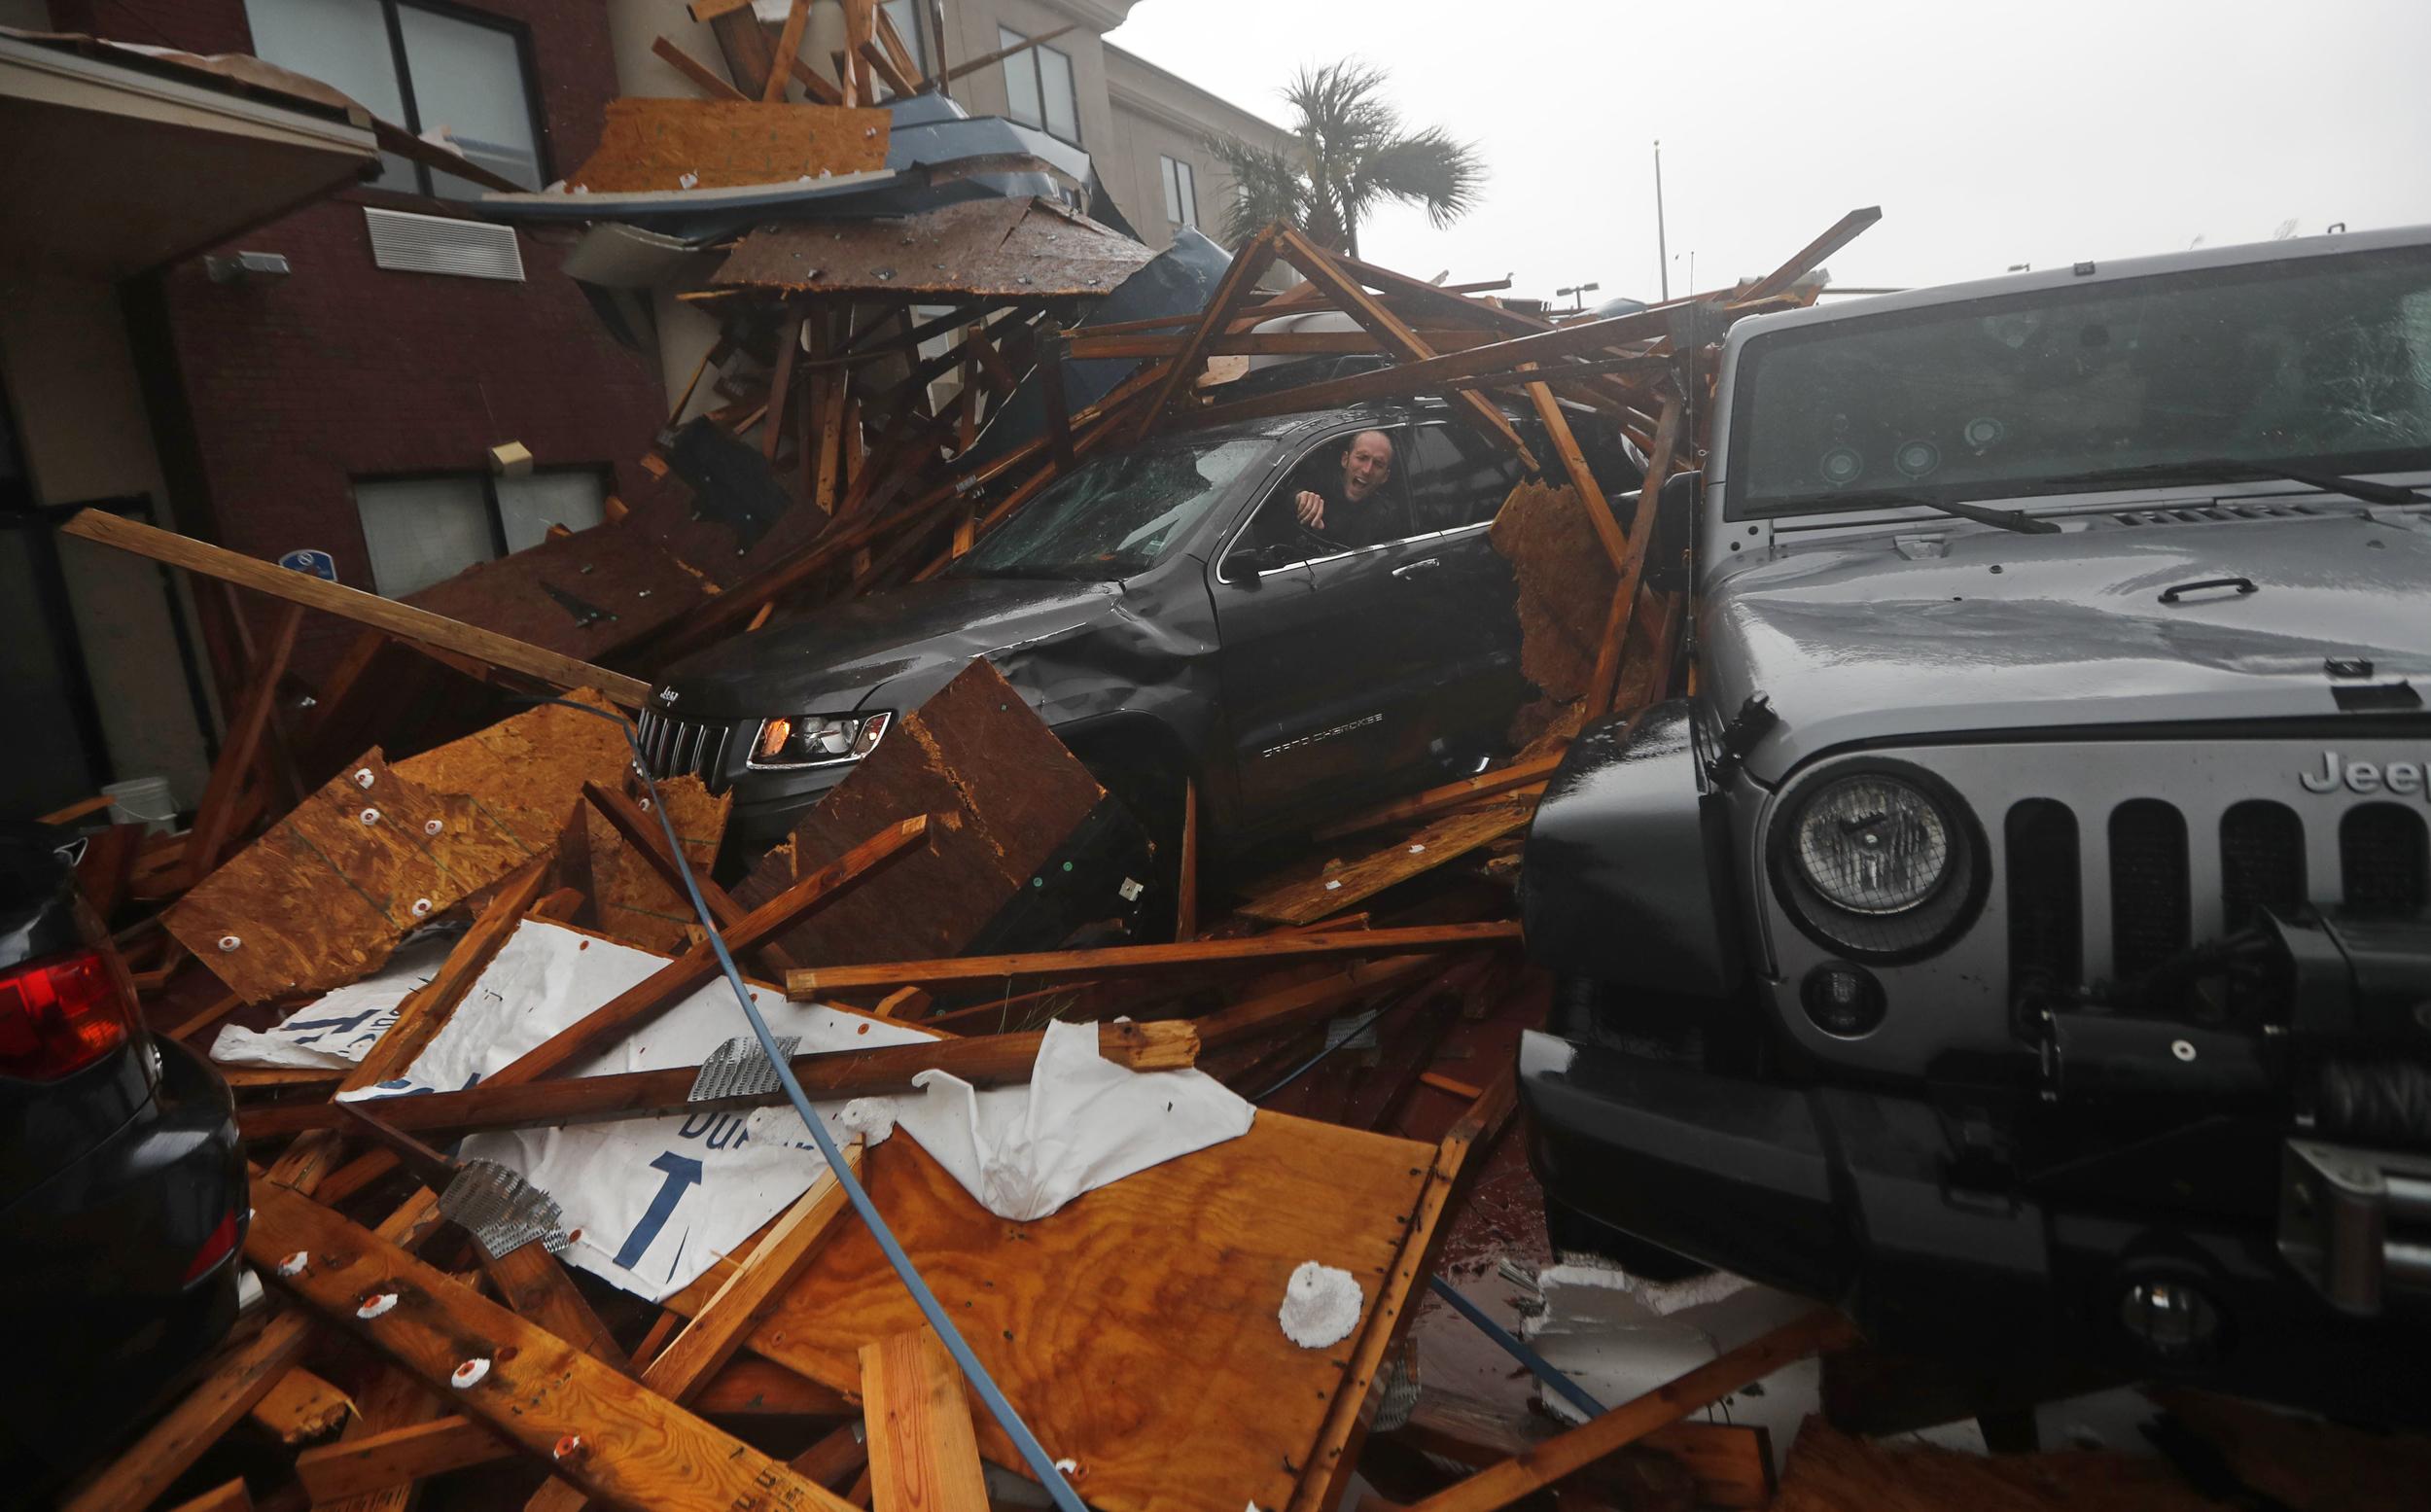 Panama-City-weathers-brunt-of-Hurricane-Michael's-destructive-force